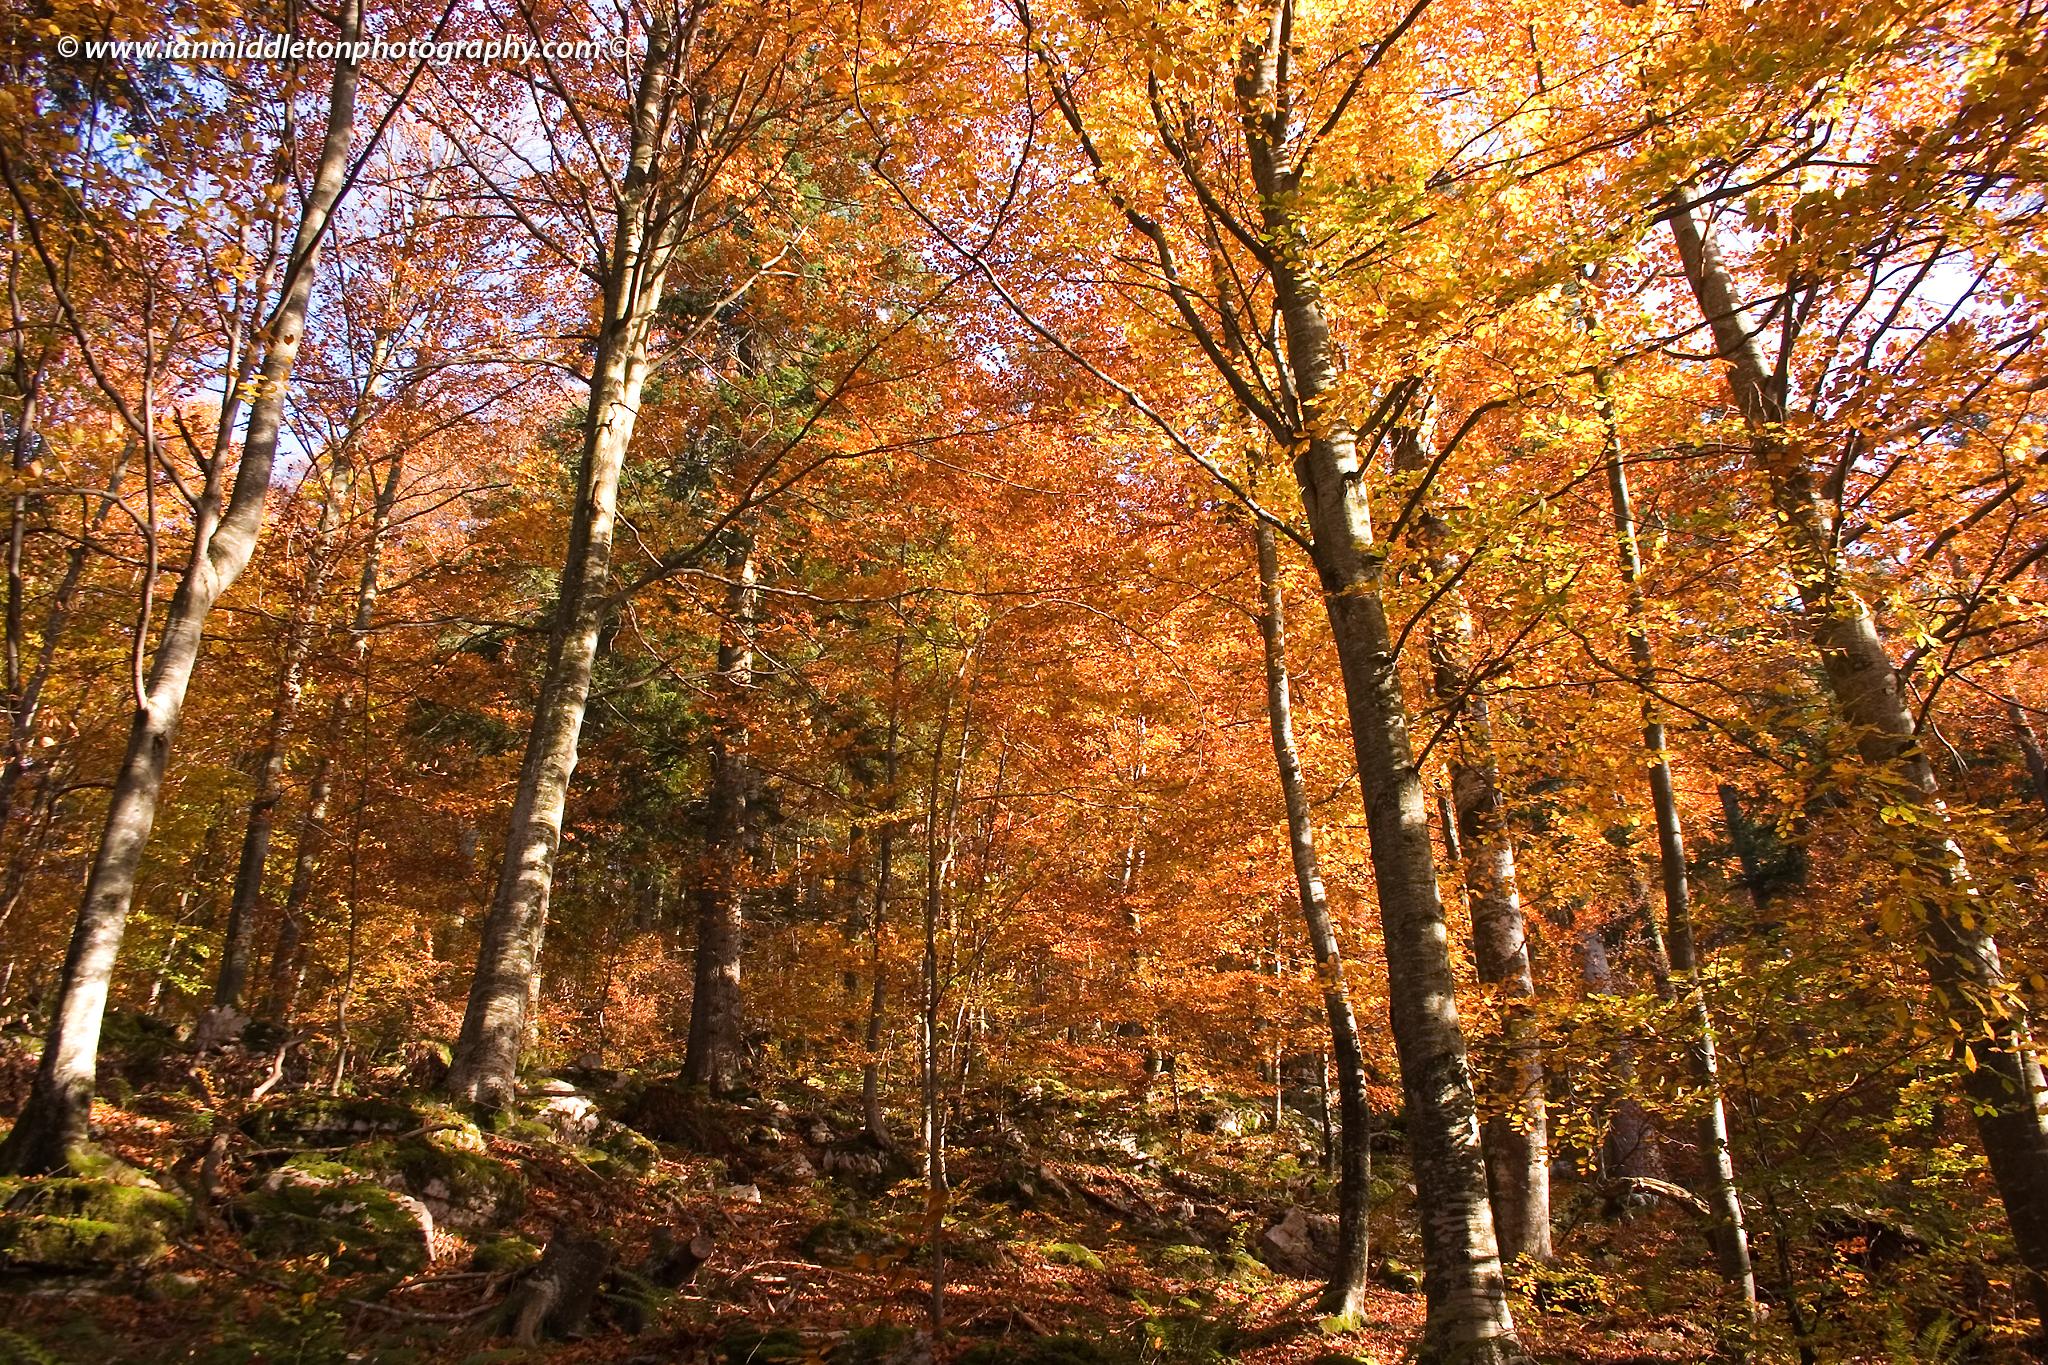 Kocevje forest in autumn, Slovenia